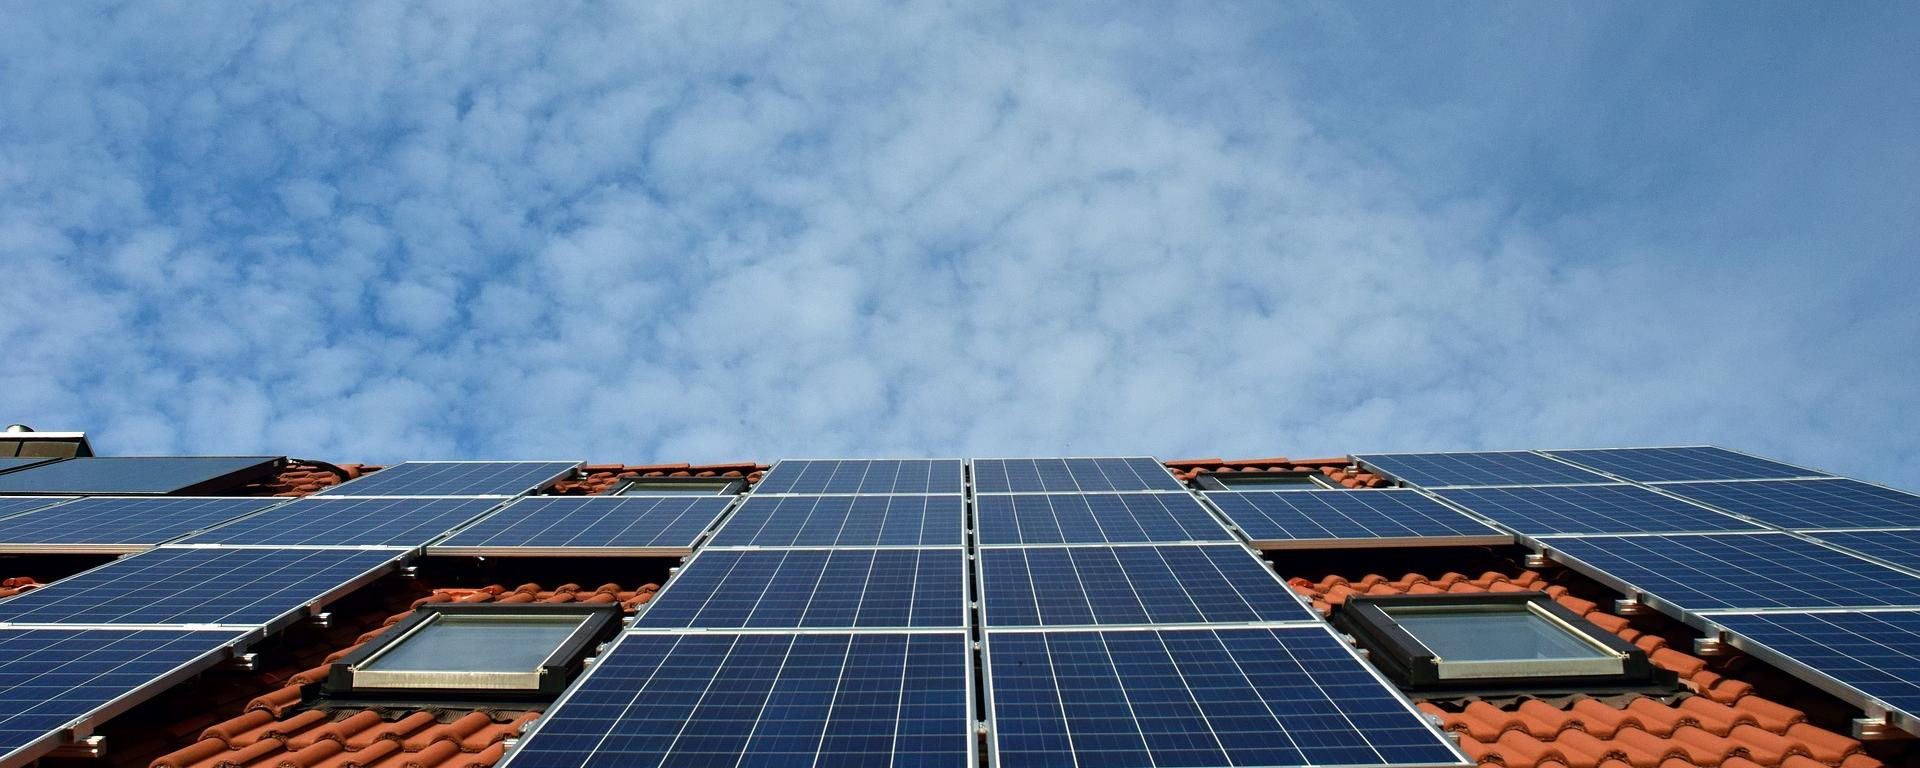 Solar Panels 12.png